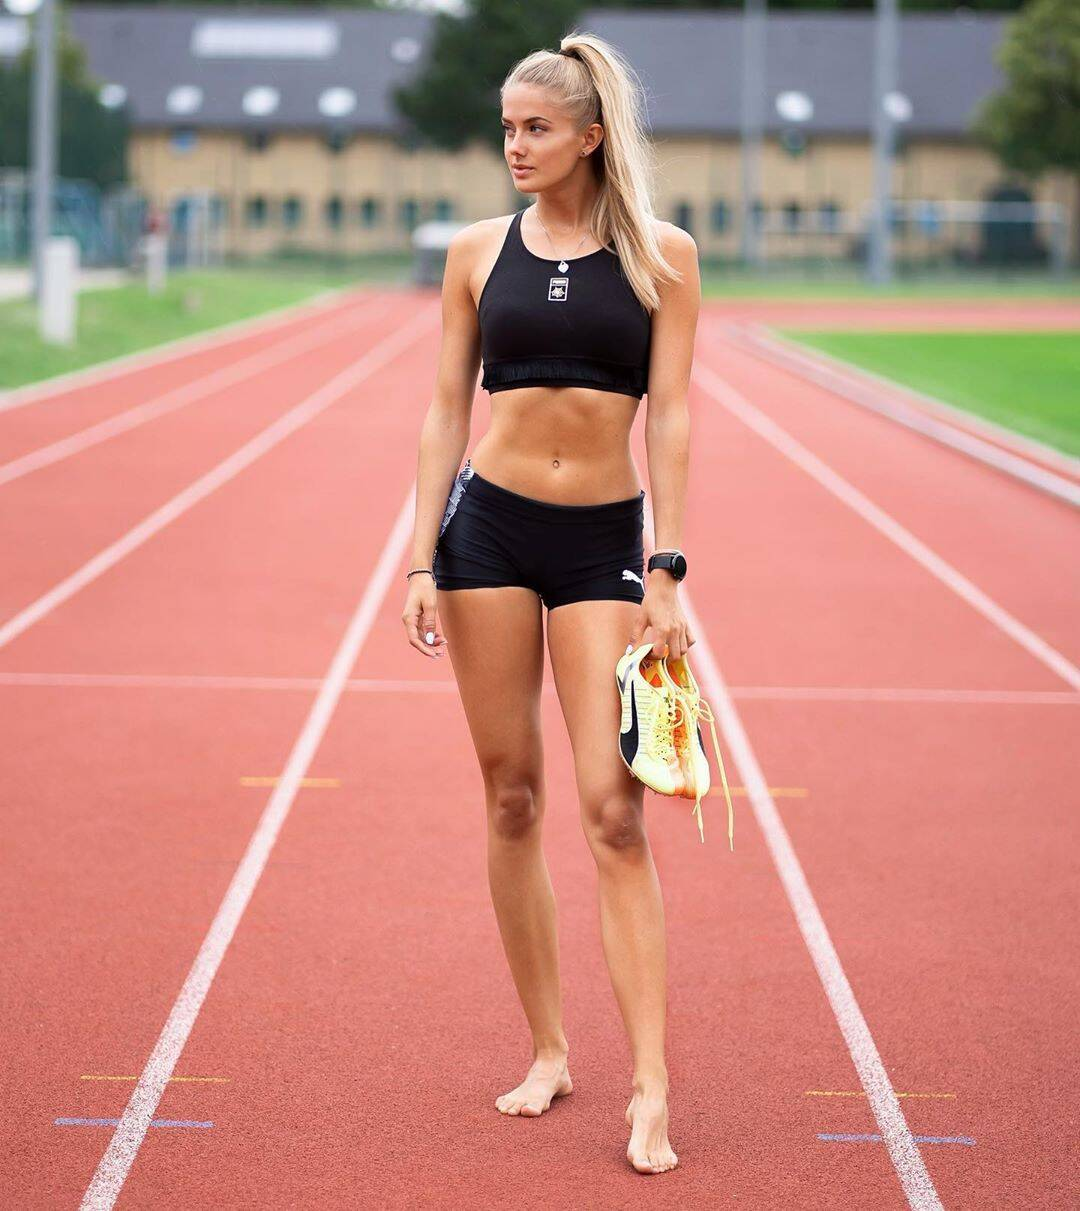 Аліса Шмідт на біговій доріжці босоніж